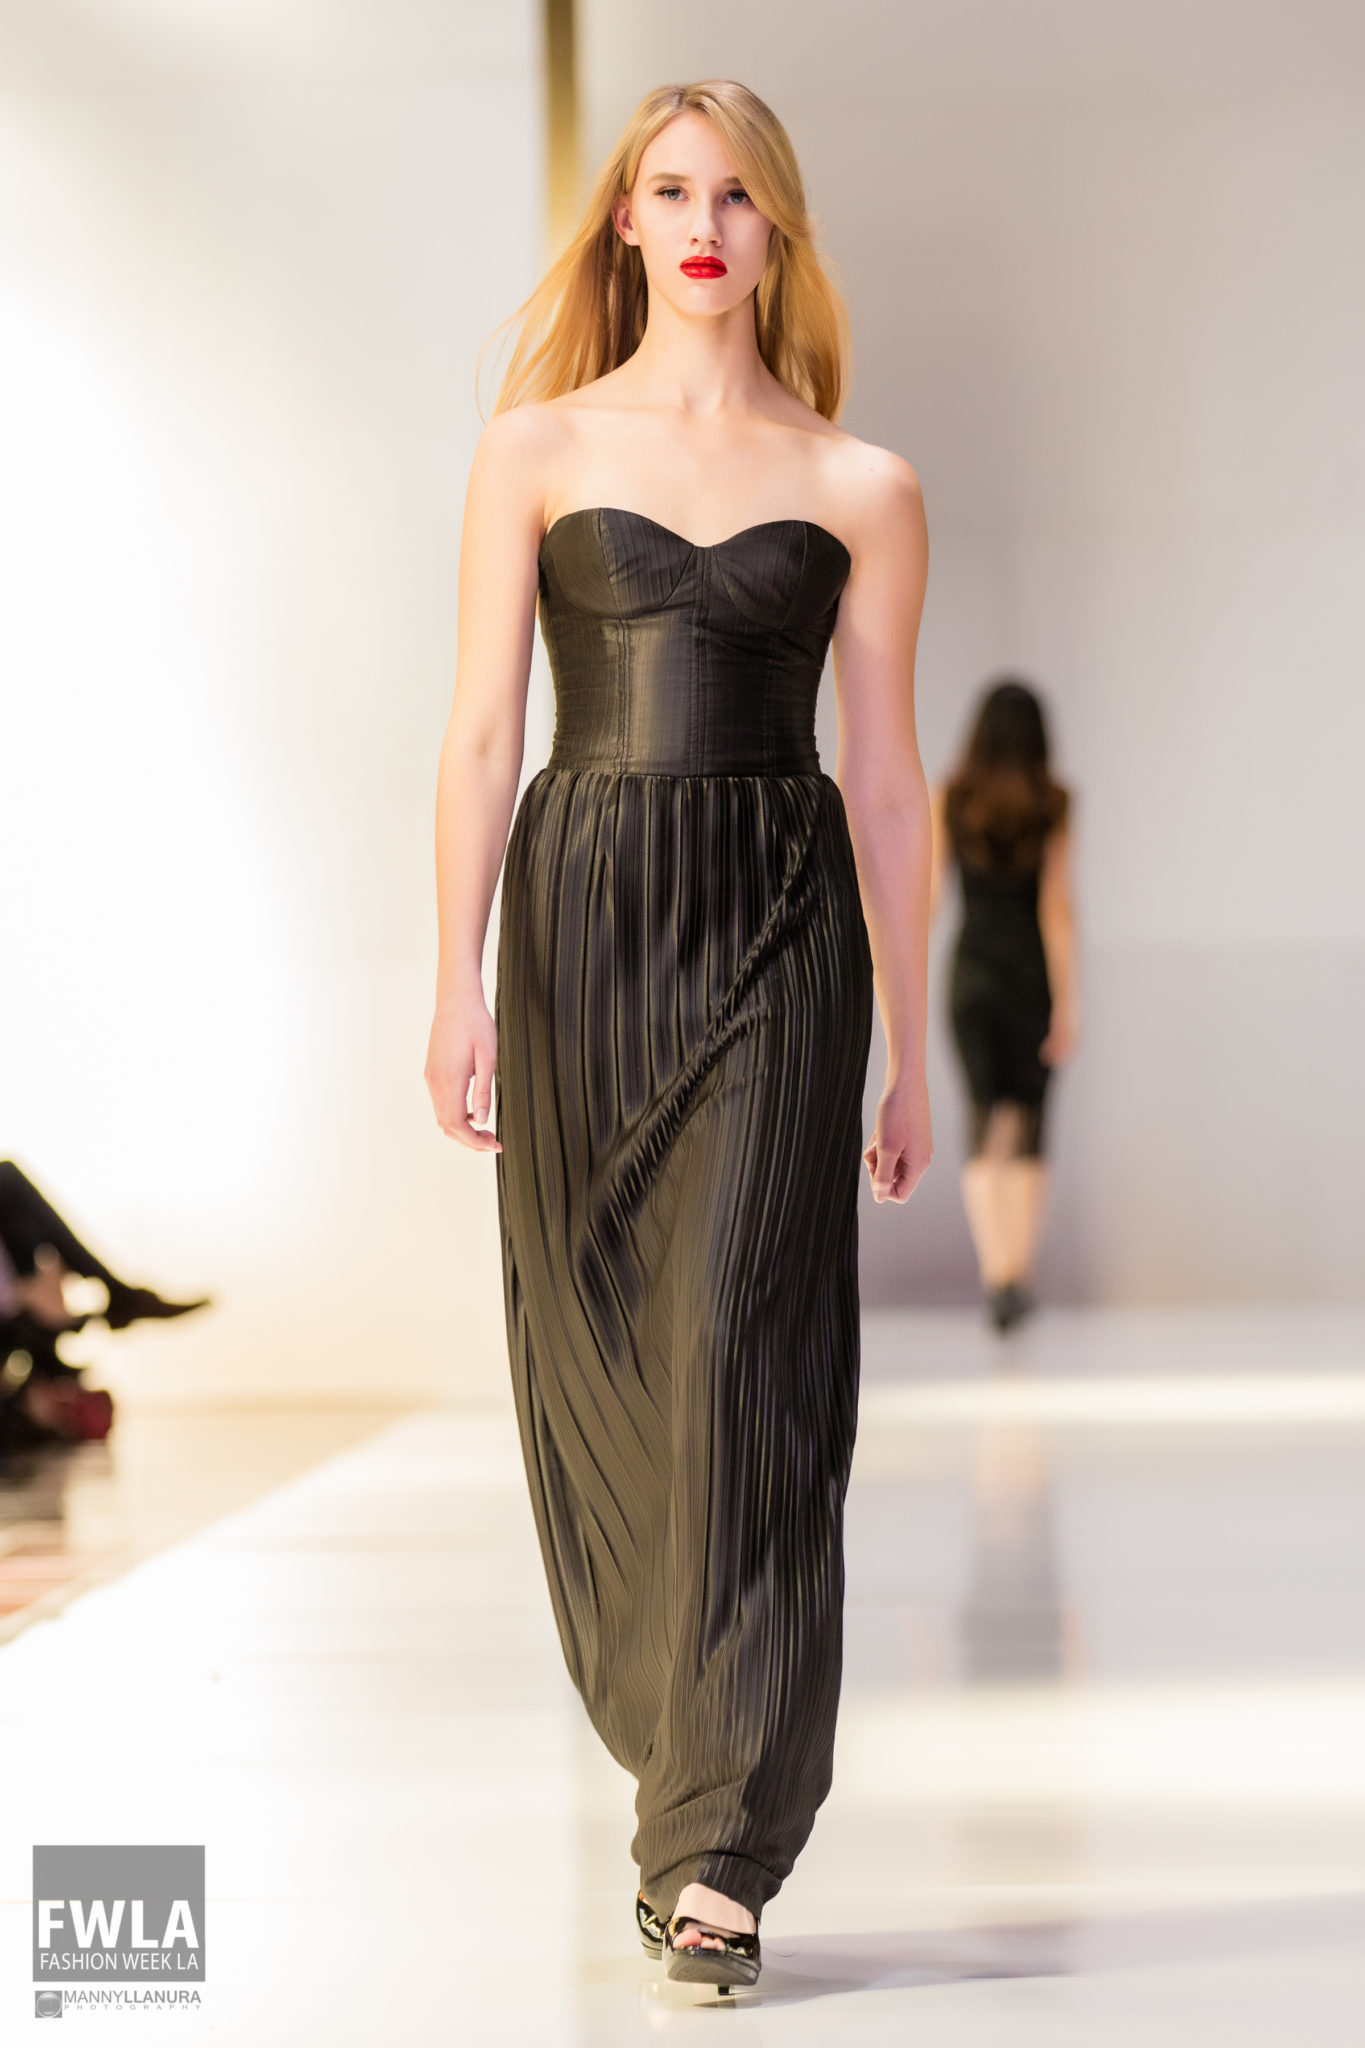 Lou Razon Designer LouLou Couture LA Fashion Week LAFW 2016